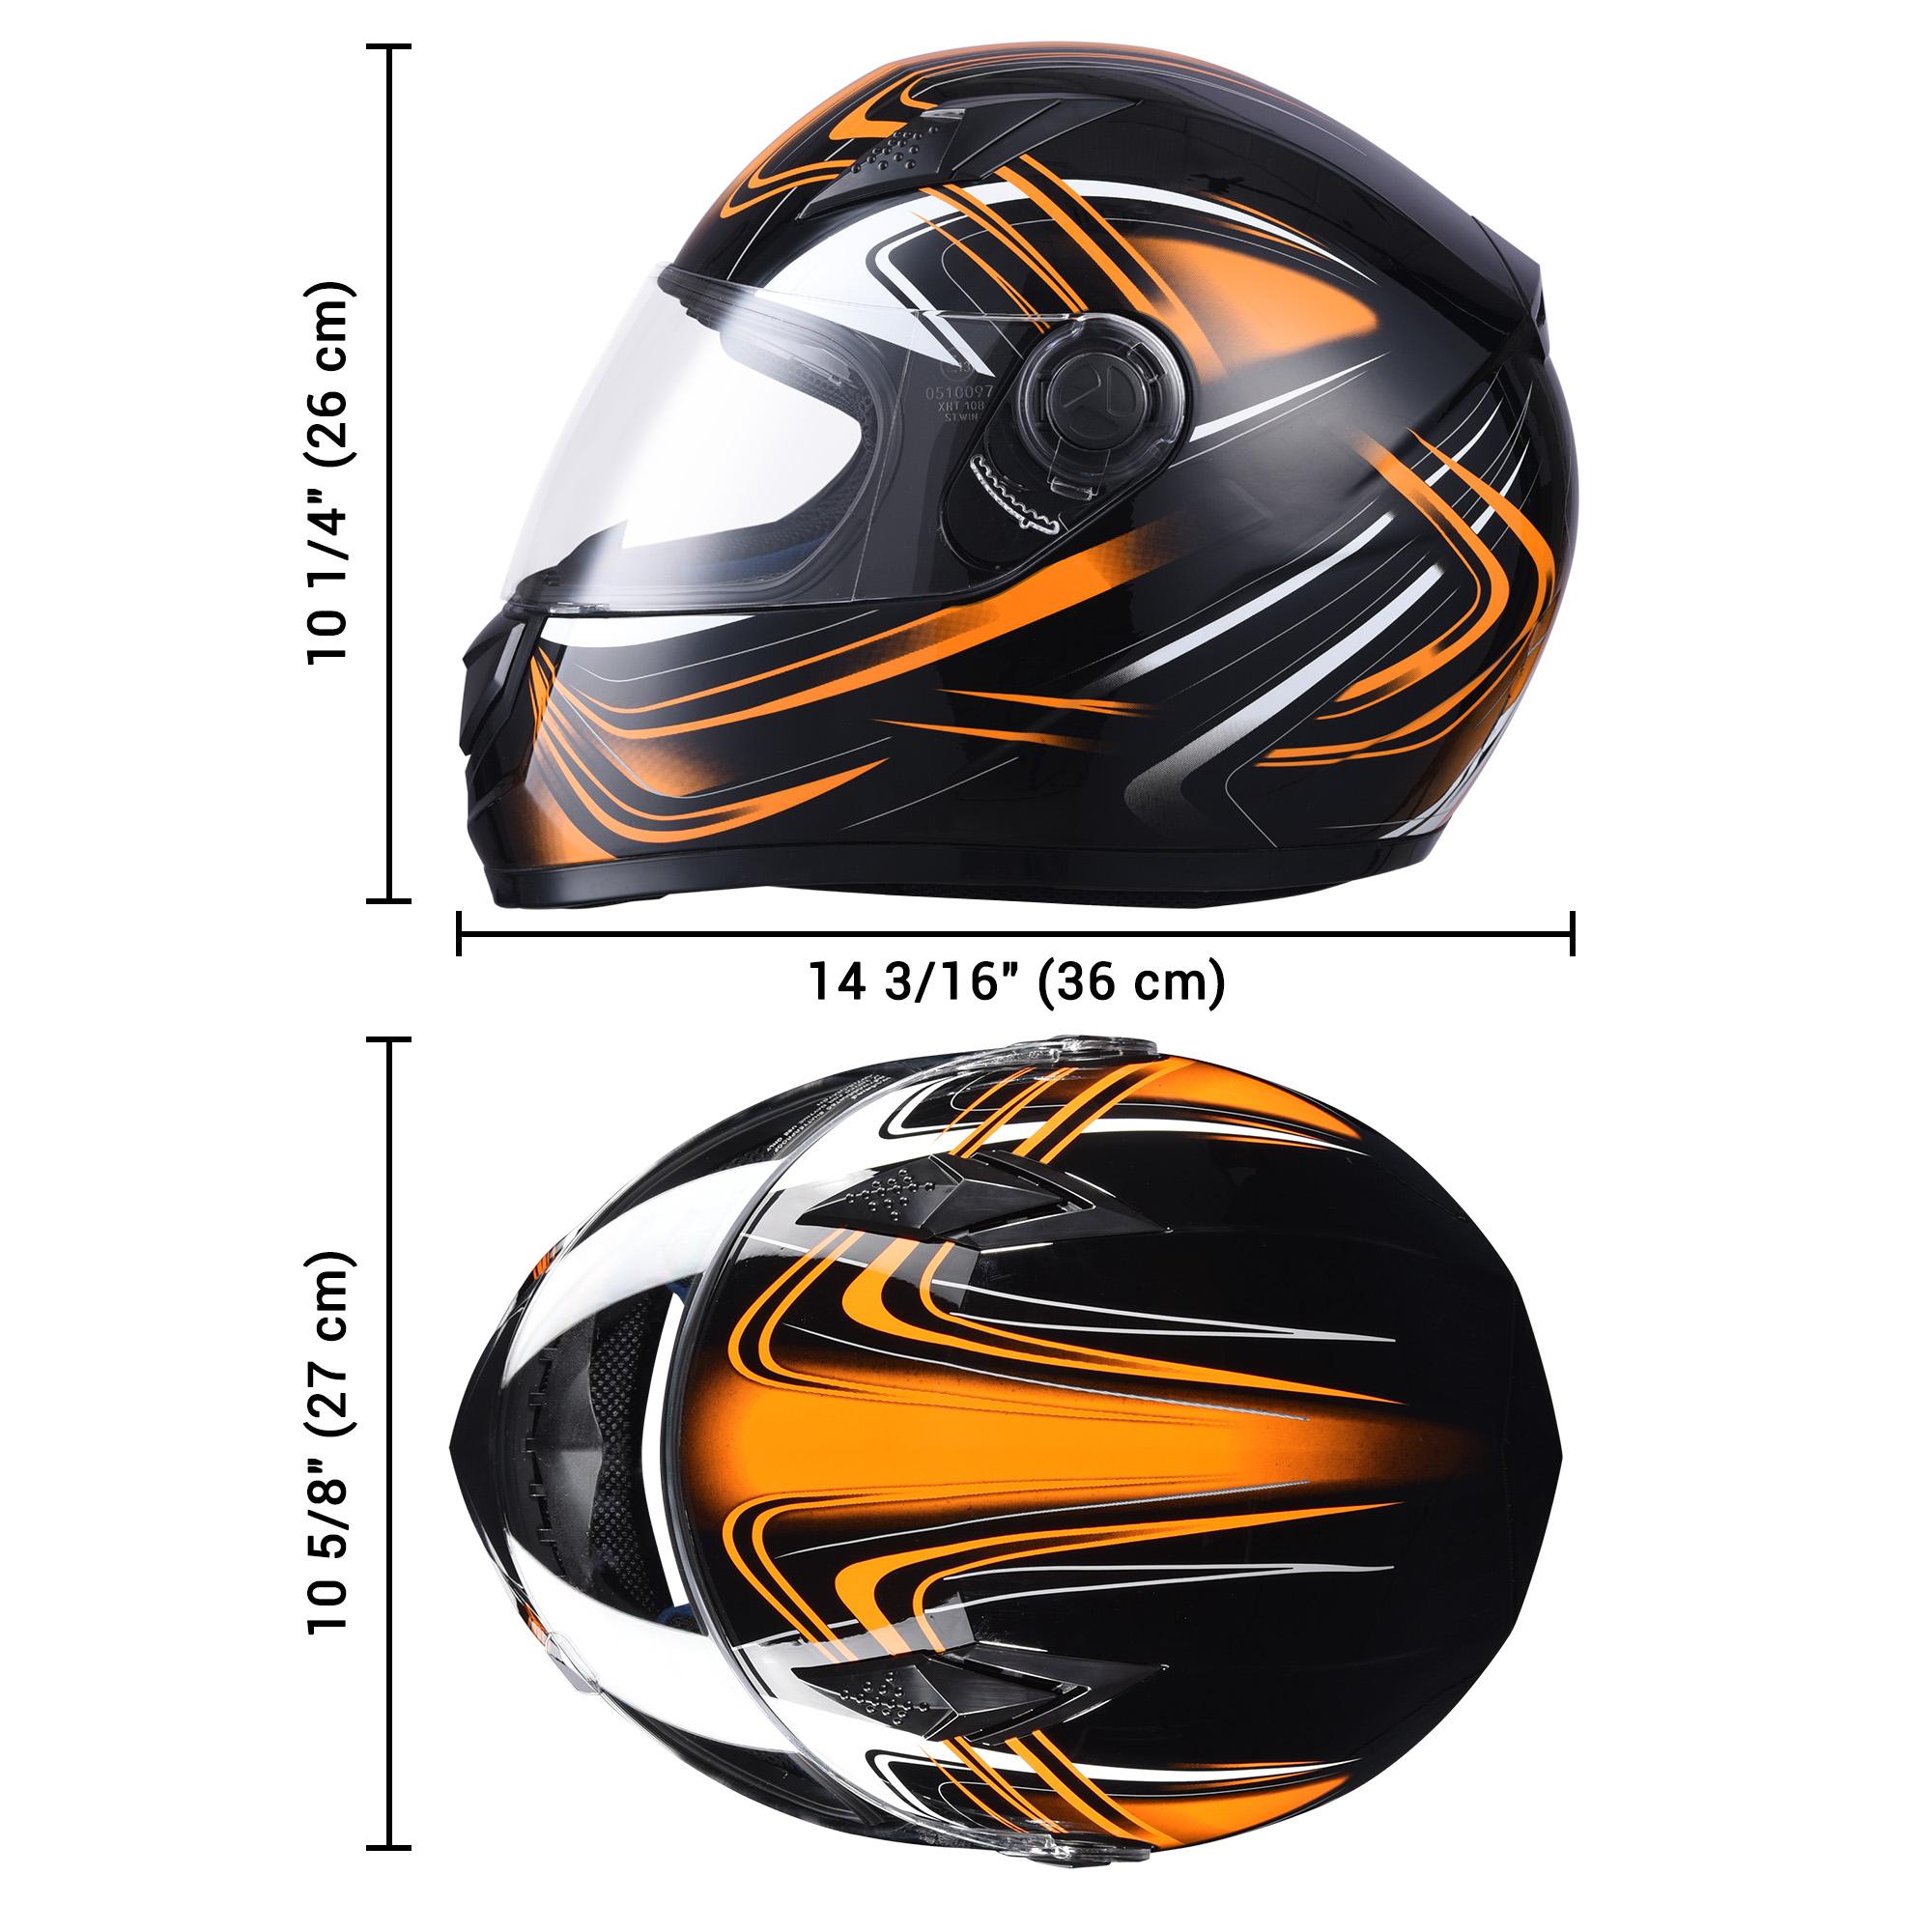 miniature 82 - AHR K12 Full Face Motorcycle Helmet DOT Air Vents Clear Visor Racing S M L XL